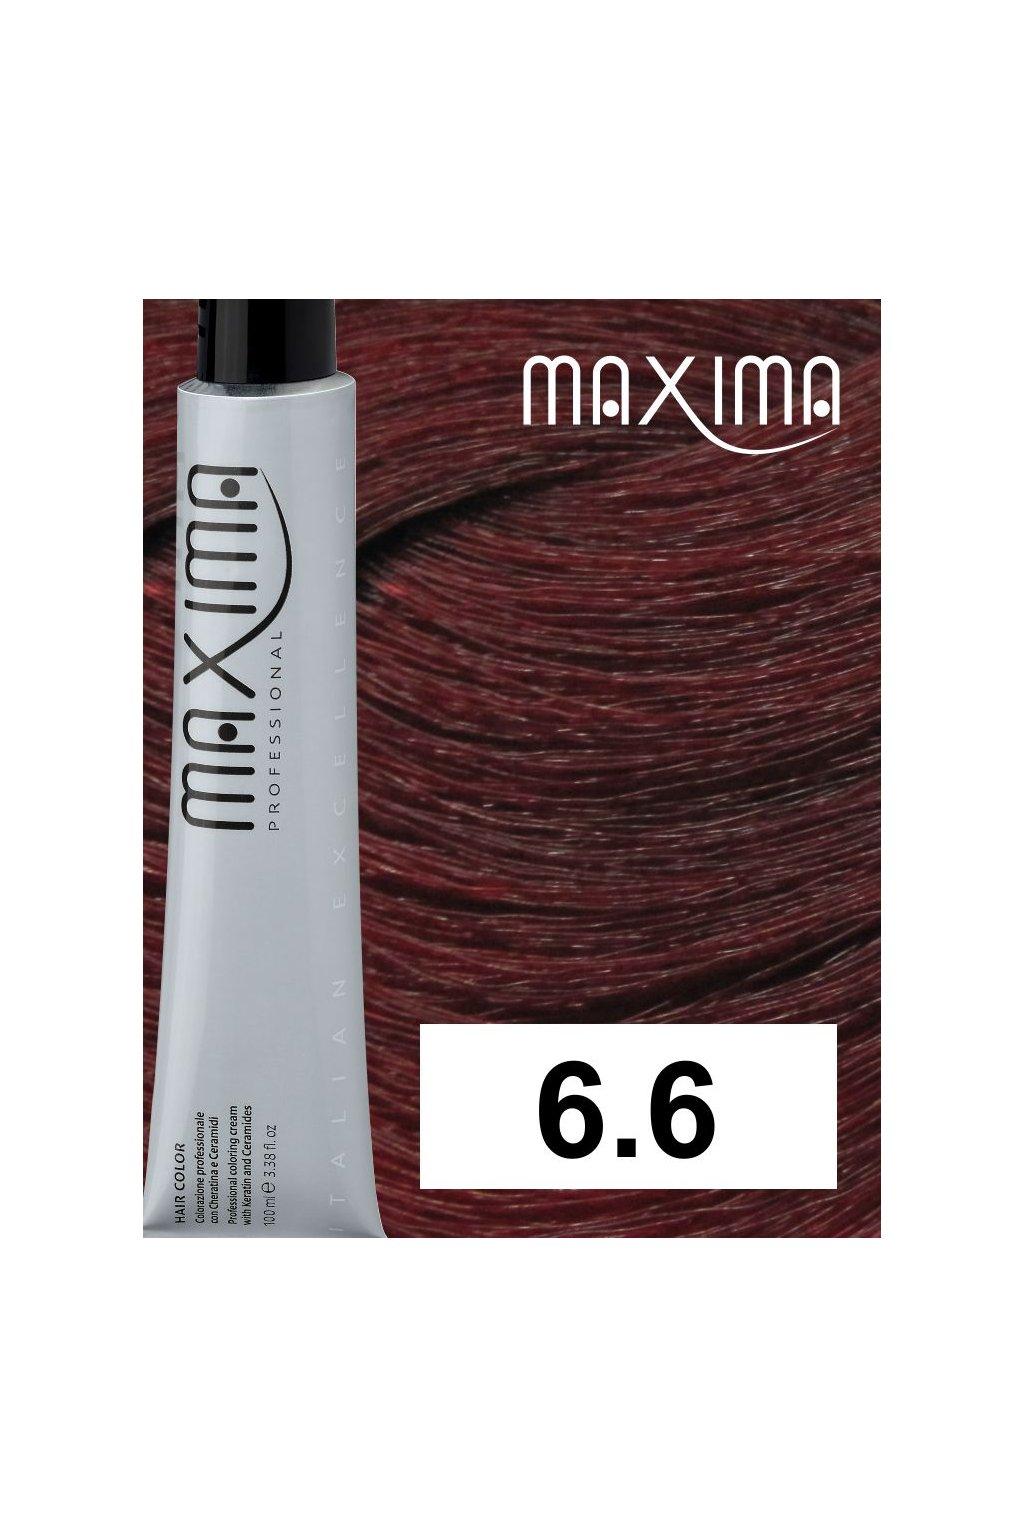 6 6 max